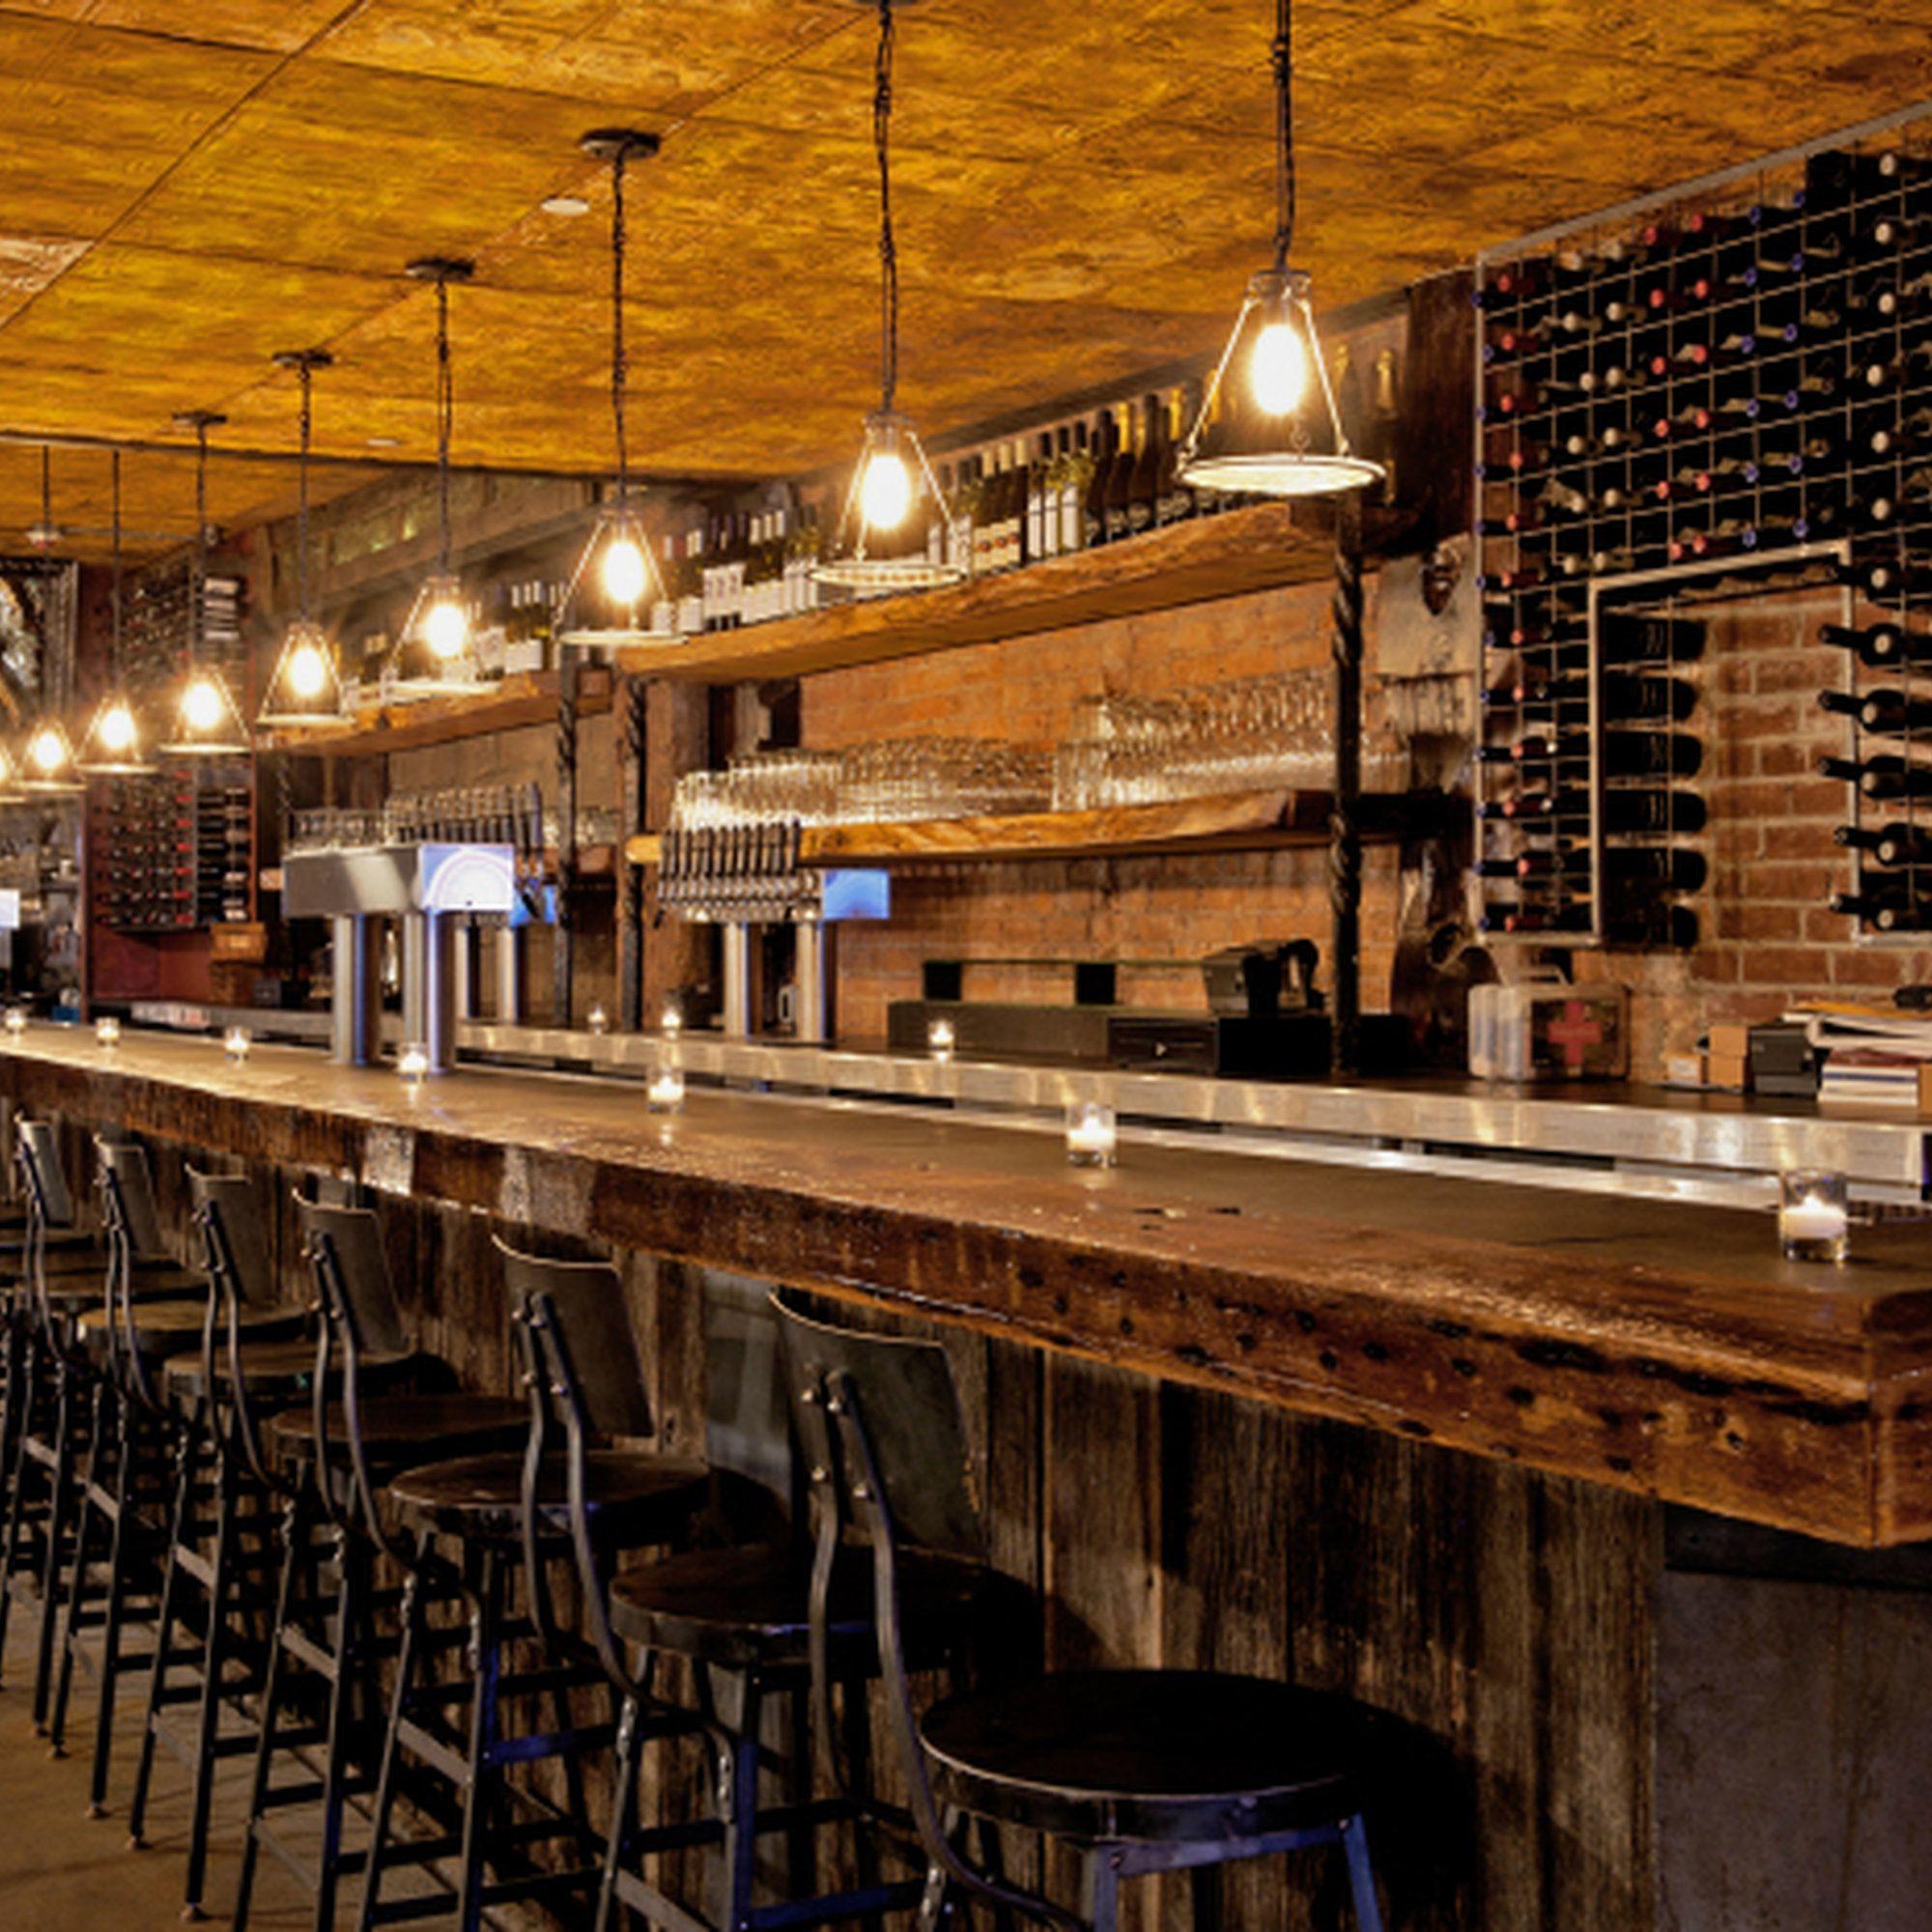 The next great beer bar | Beer bar, Bar and Pub ideas